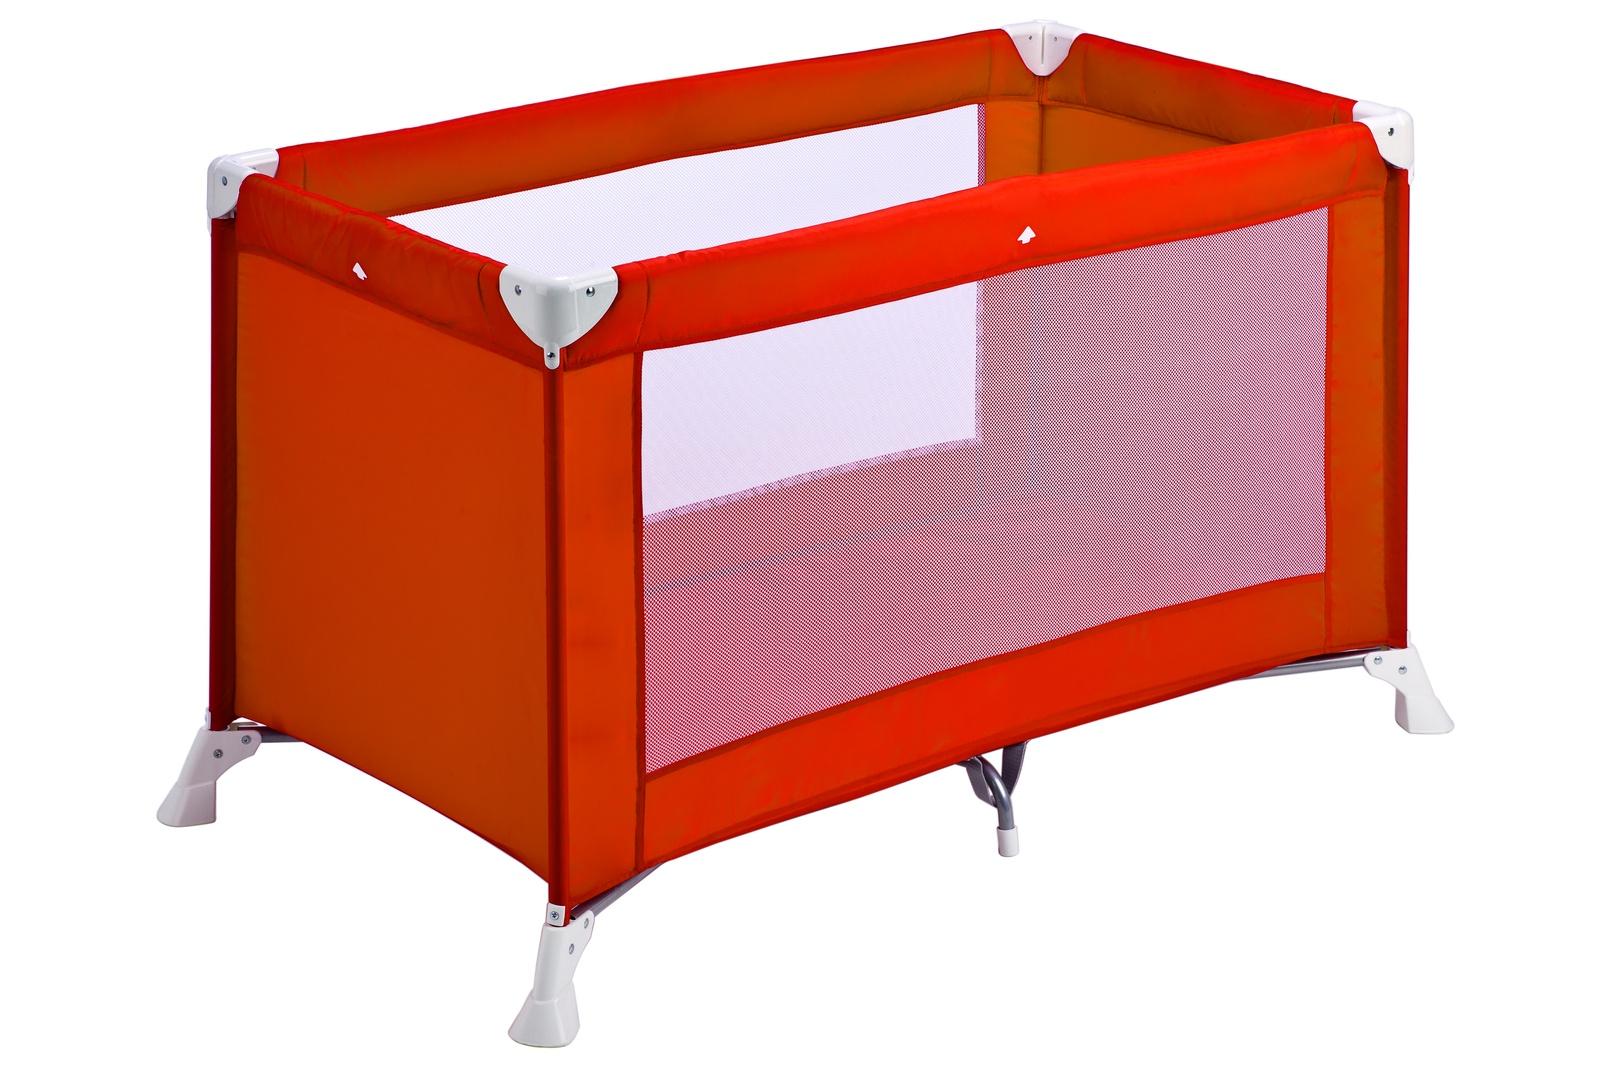 Манеж-кроватка Safety 1st Soft Dreams 2112260000 , 2112260000 красный